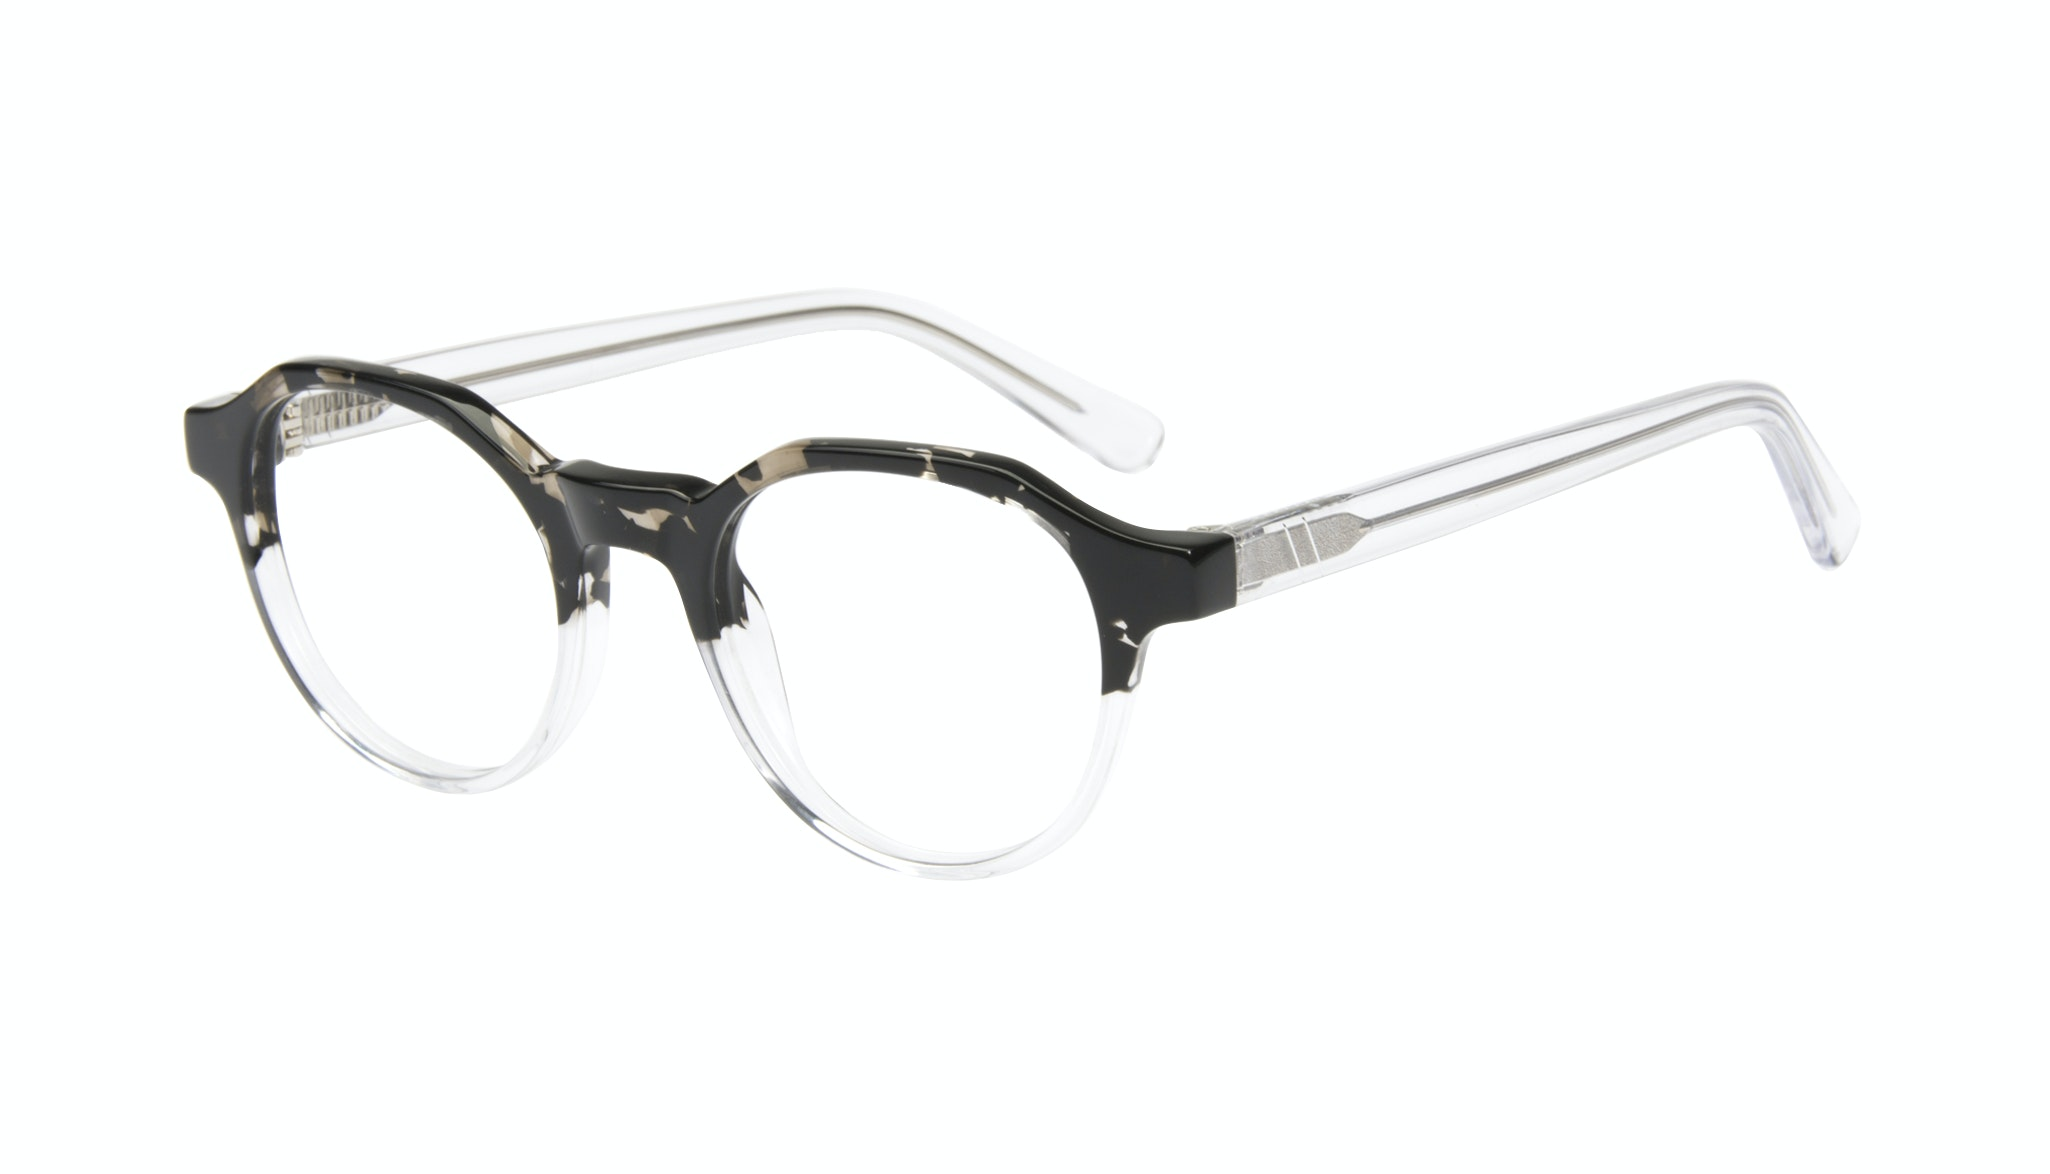 Affordable Fashion Glasses Round Eyeglasses Men Form Stone Clear Tilt